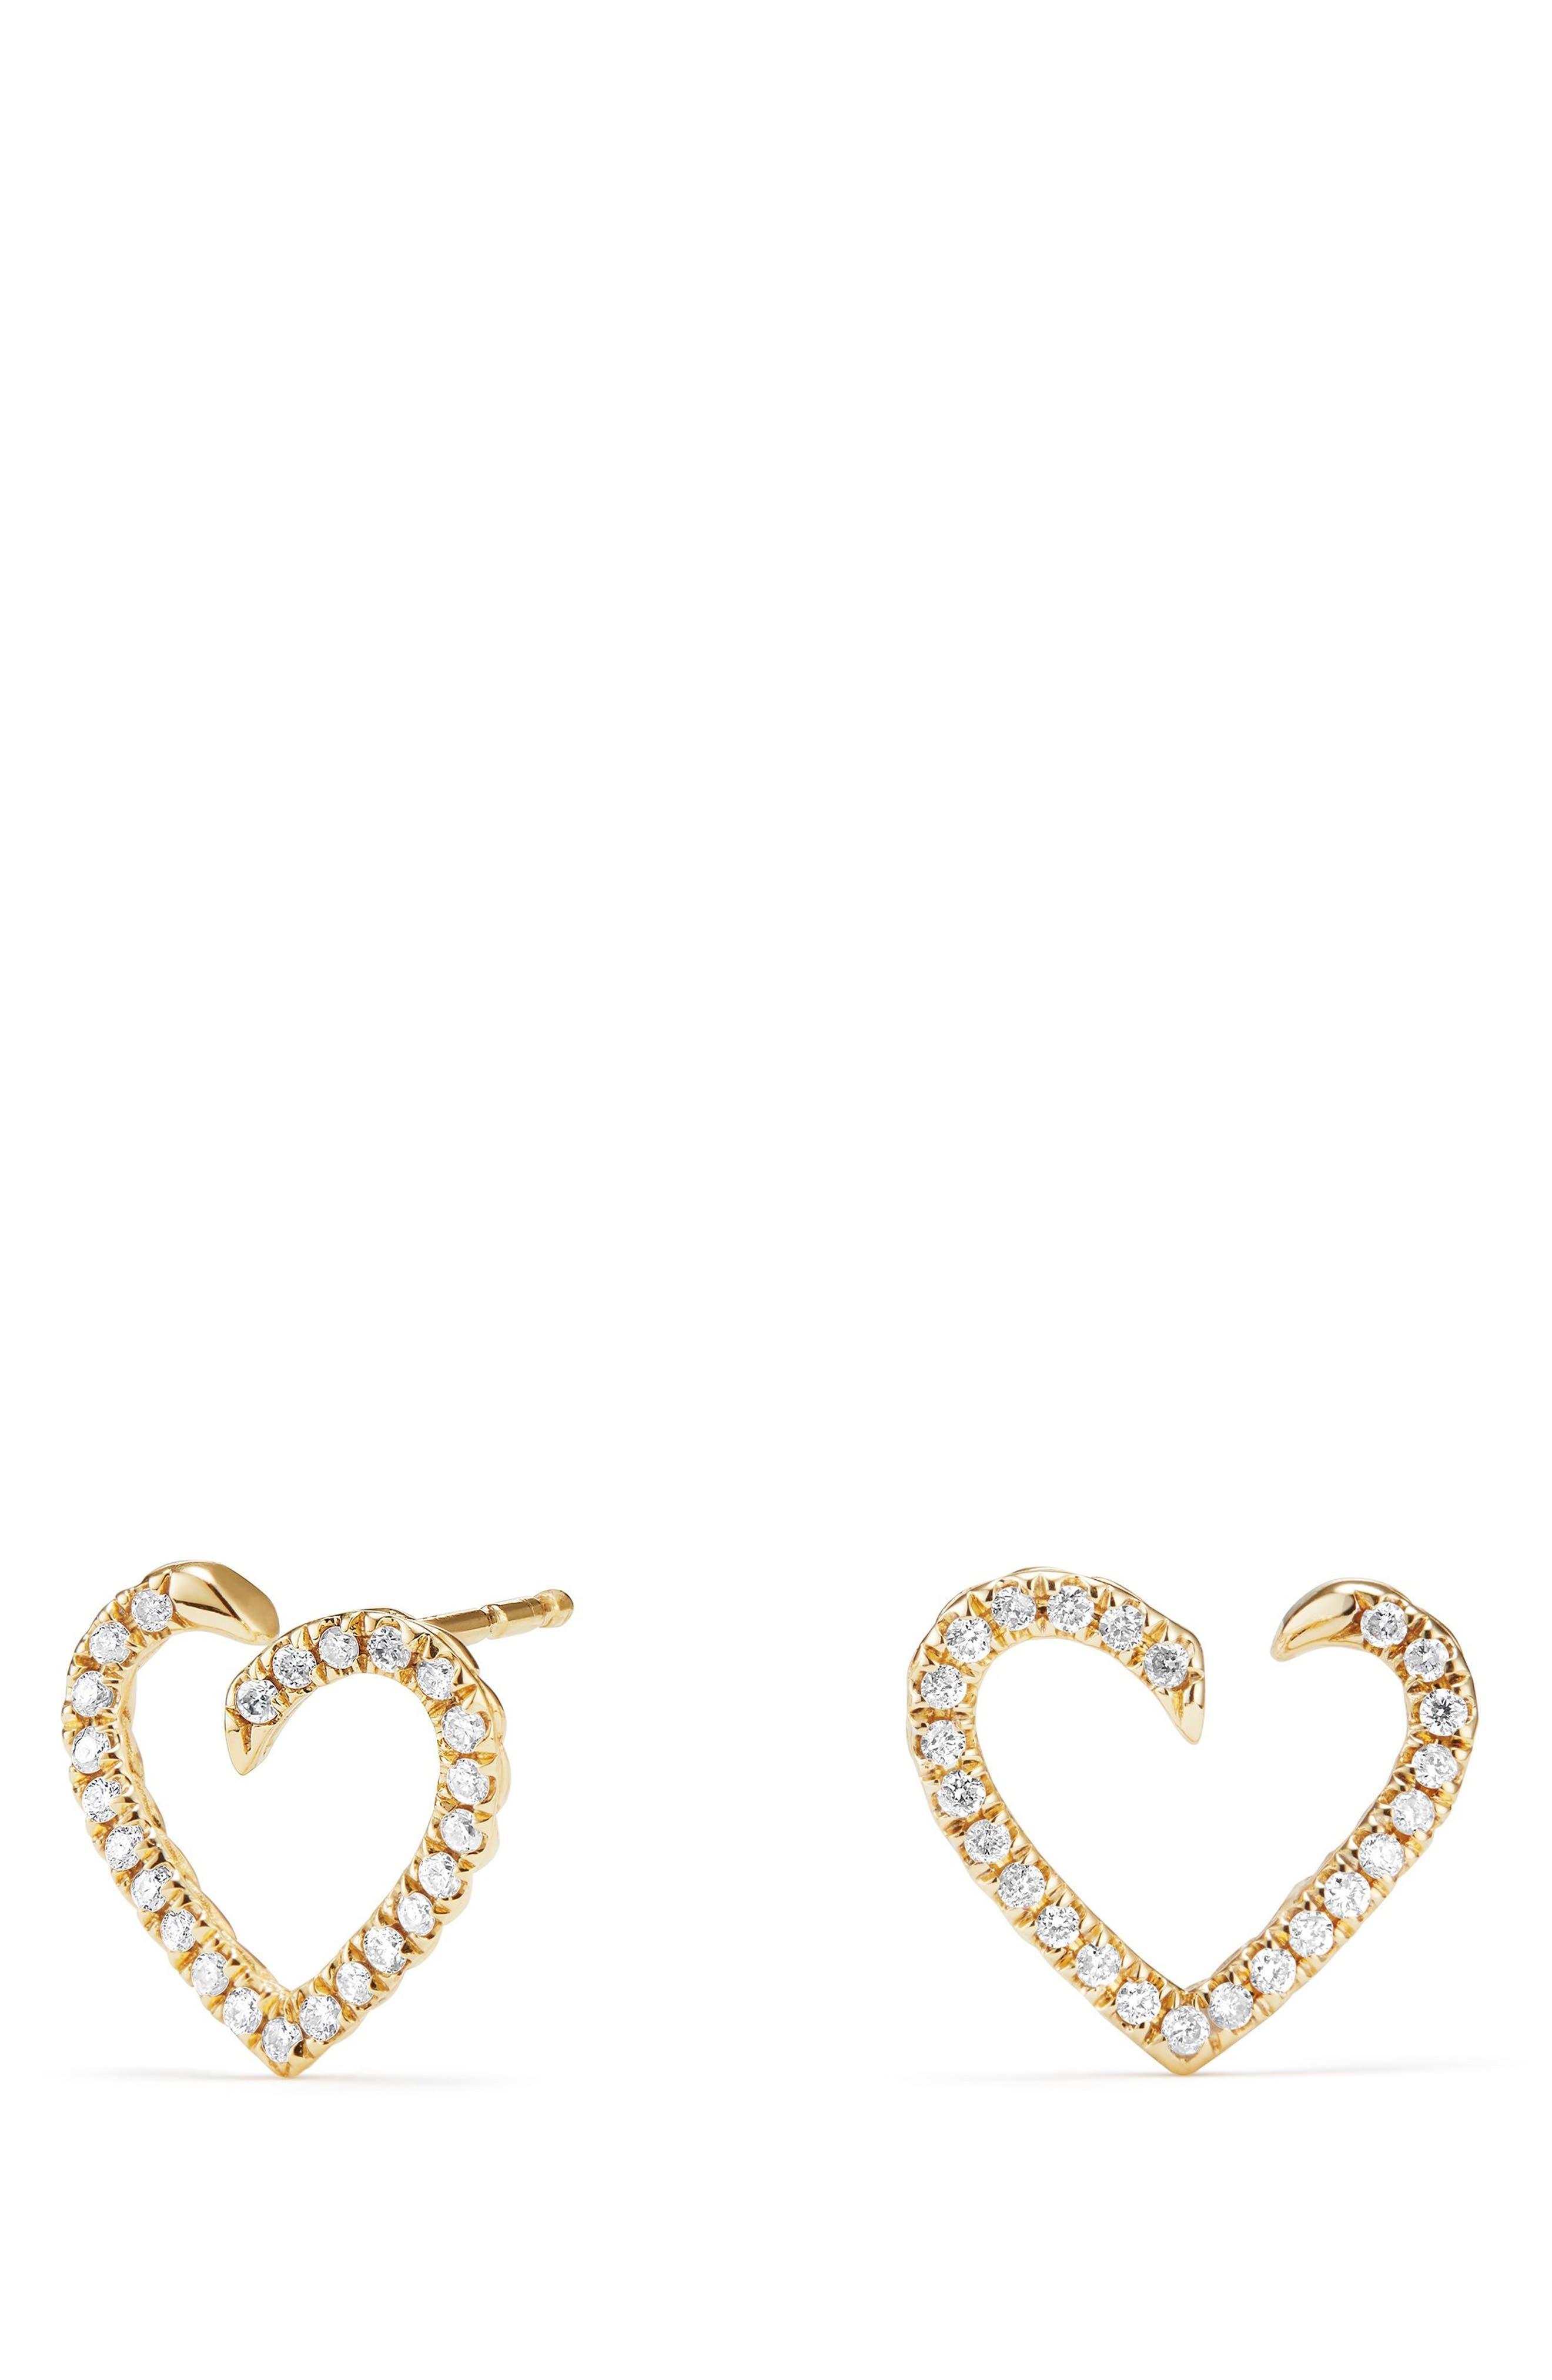 Main Image - David Yurman Heart Wrap Earrings with Diamonds in 18K Gold